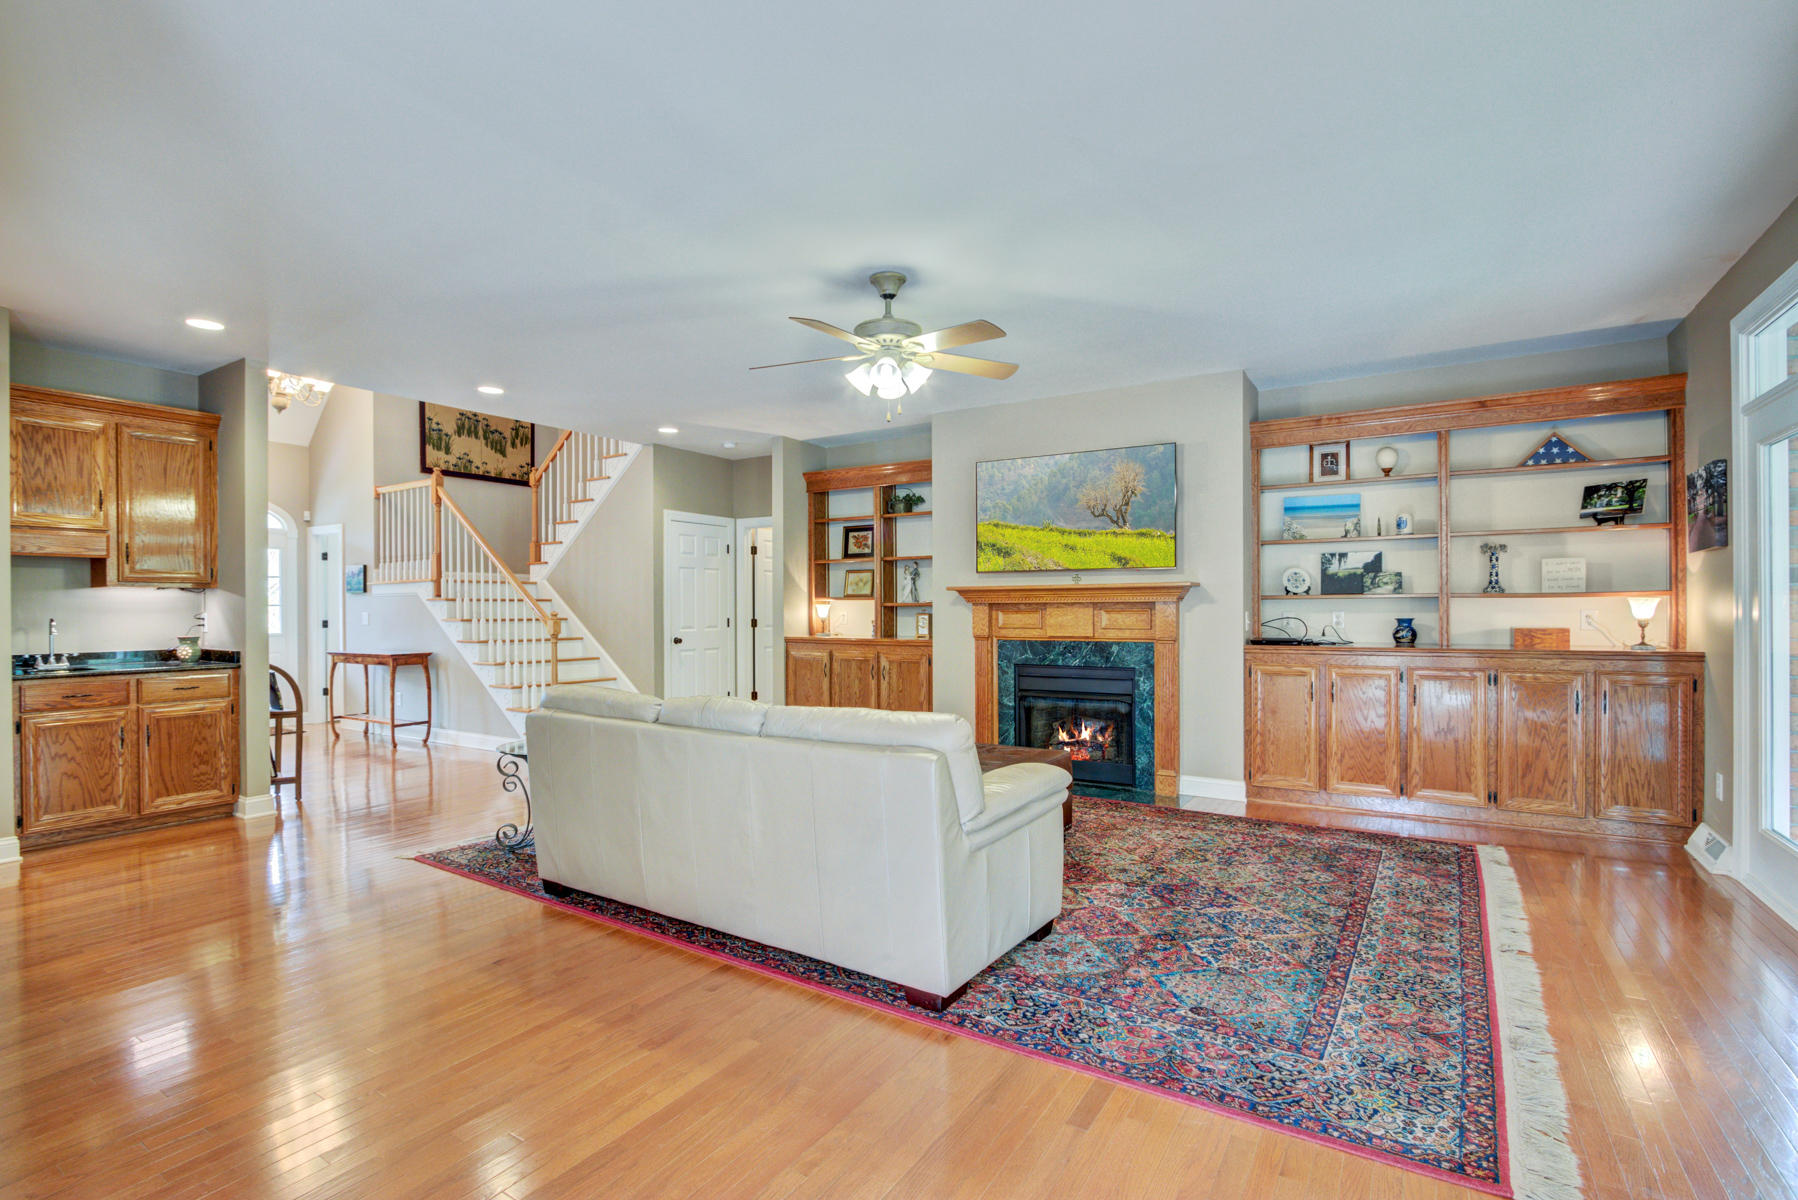 Cedar Grove Homes For Sale - 8733 Millerville, North Charleston, SC - 6